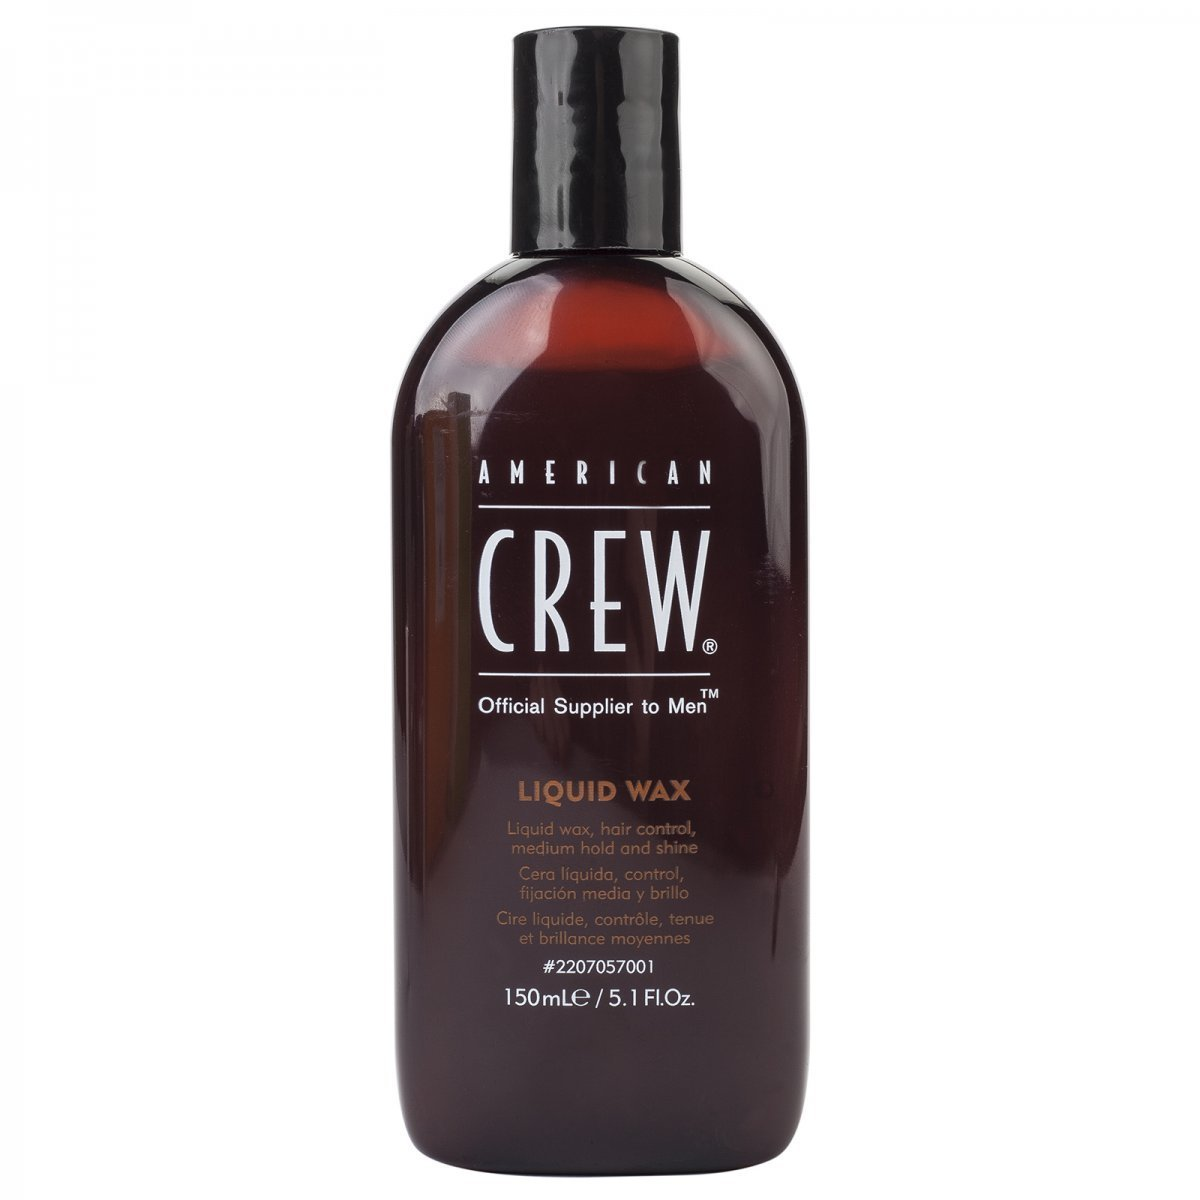 American Crew Liquid Wax - Жидкий воск, 150 мл